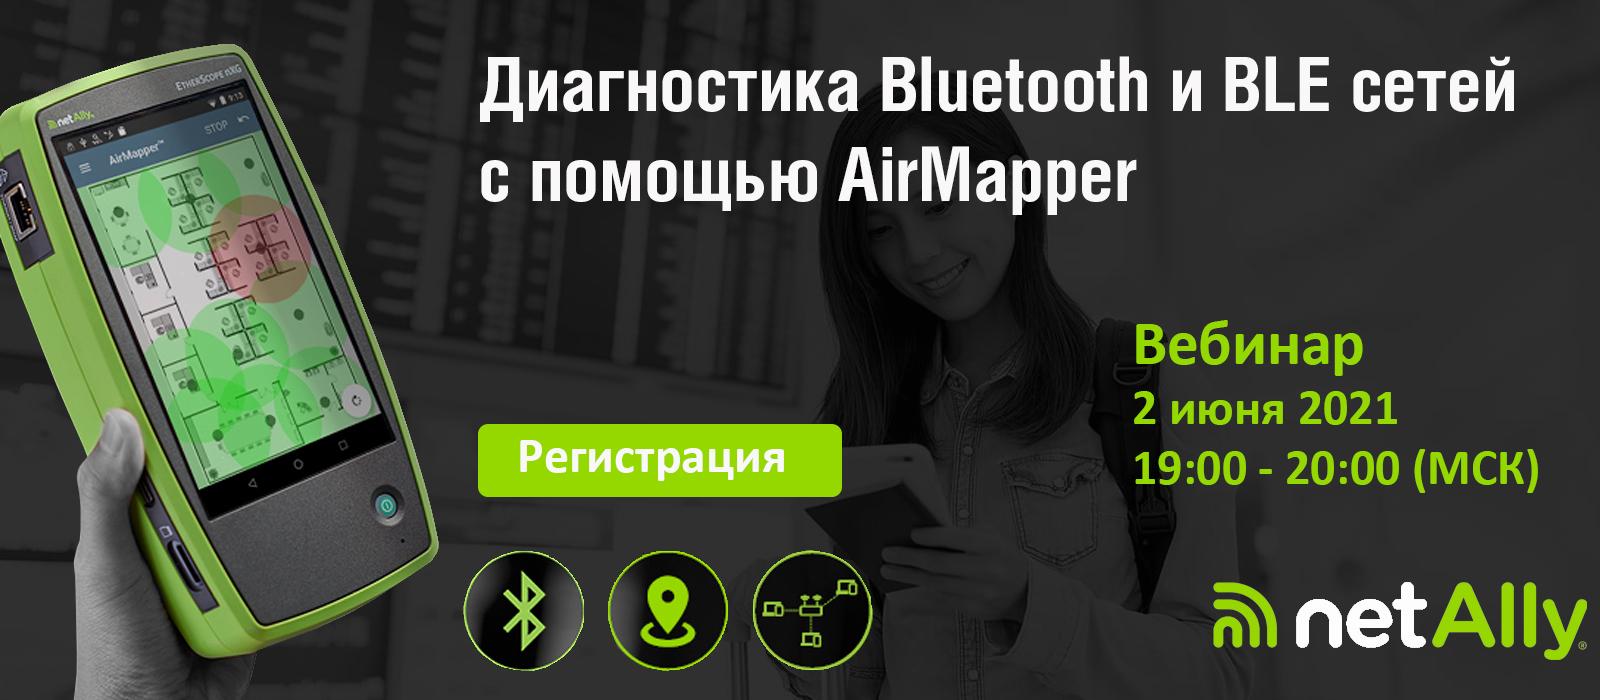 "Вебинар ""Диагностика Bluetooth и BLE сетей с помощью AirMapper"" кампании NetAlly"